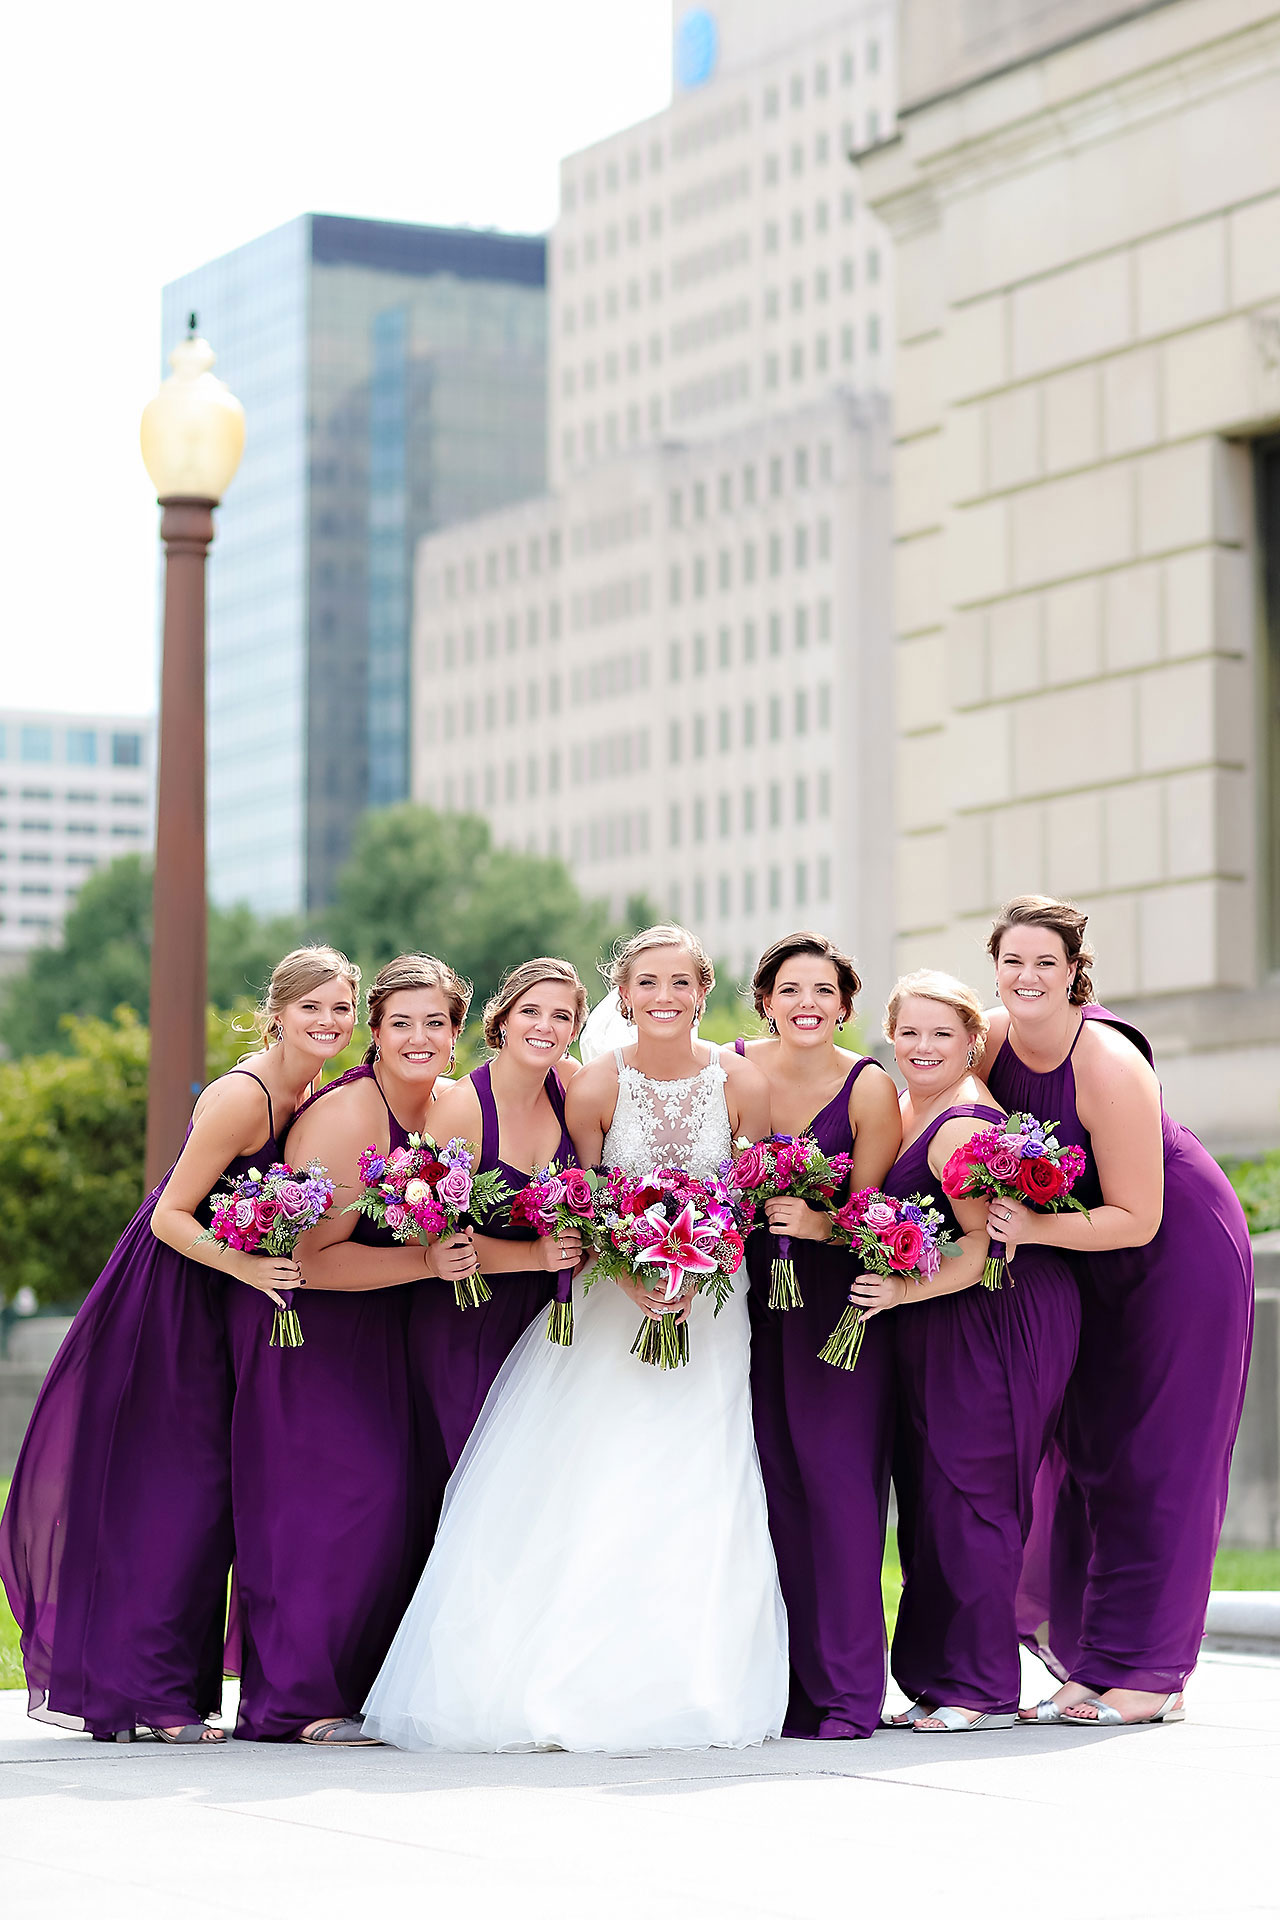 Serra Alex Regions Tower Indianapolis Wedding 087 watermarked